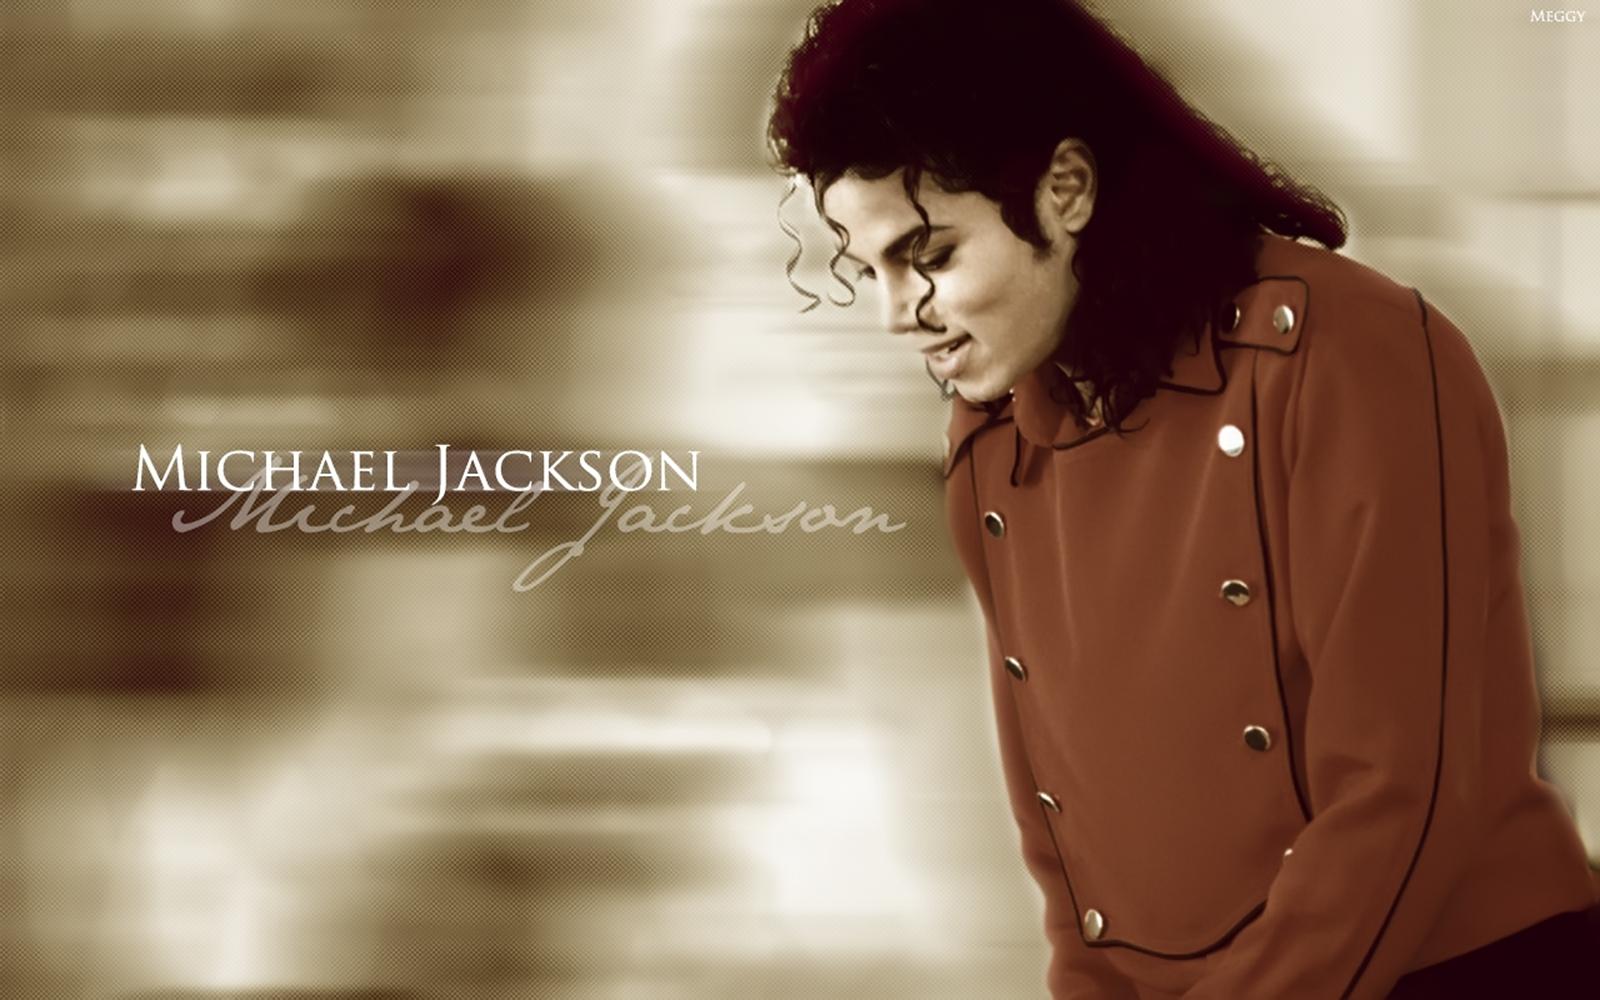 Michael Jackson Hd Demi Lovato Ellen